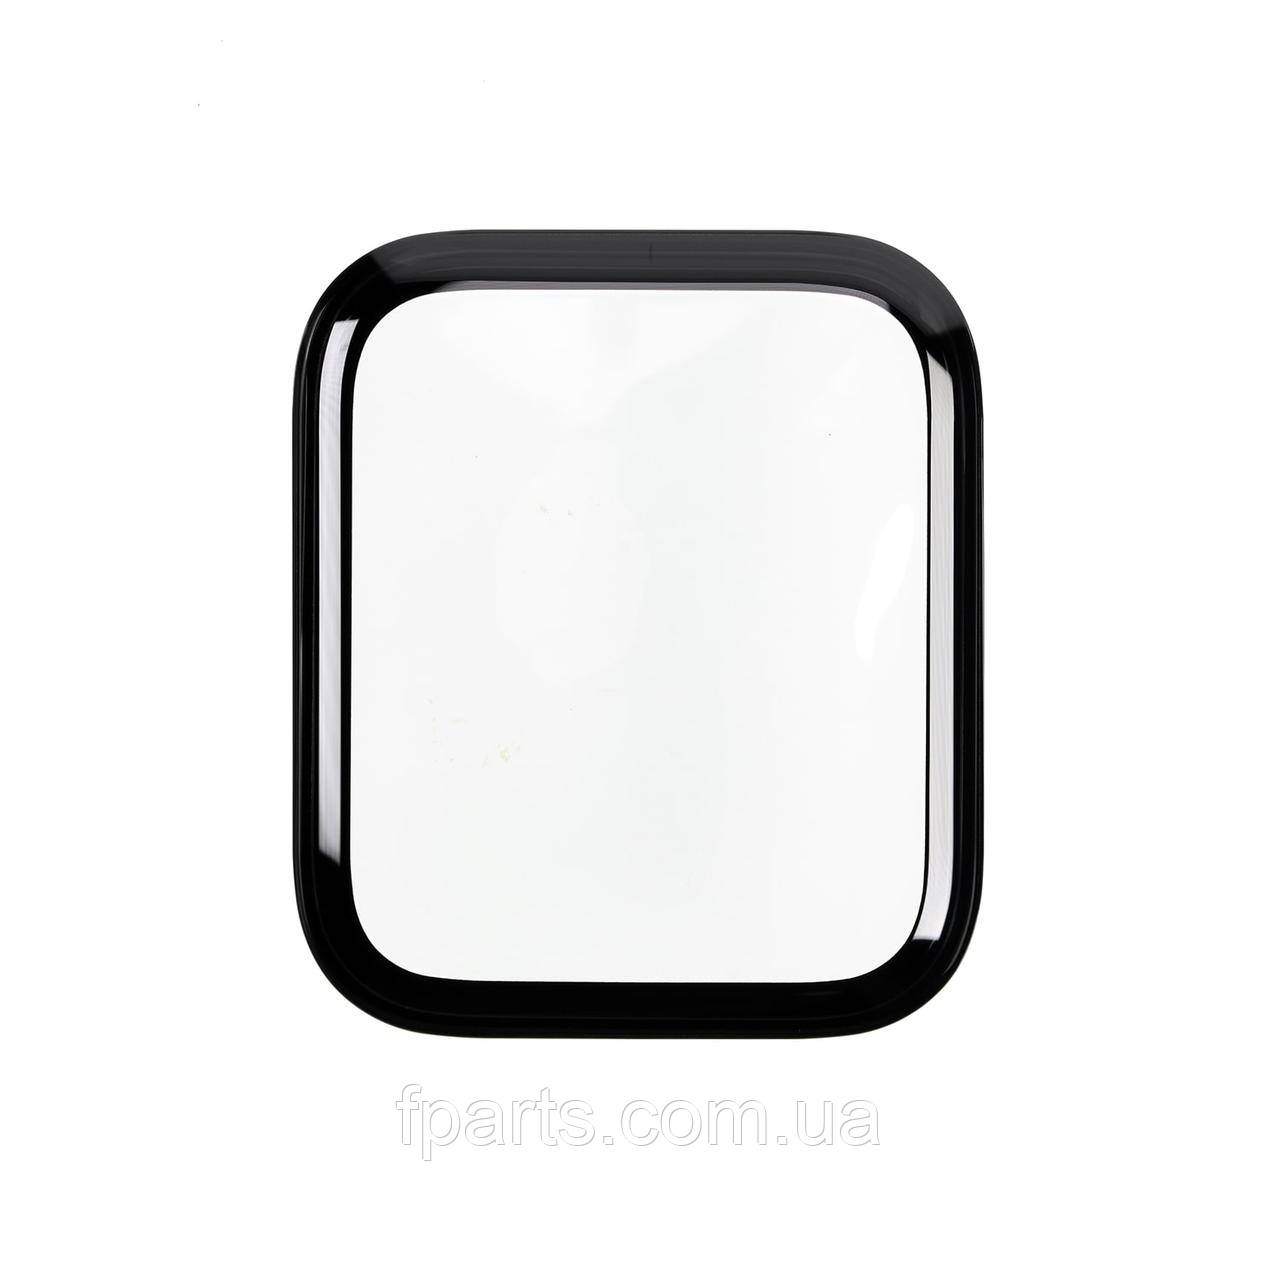 Скло дисплея Apple Watch S4, S5, SE, S6 44mm